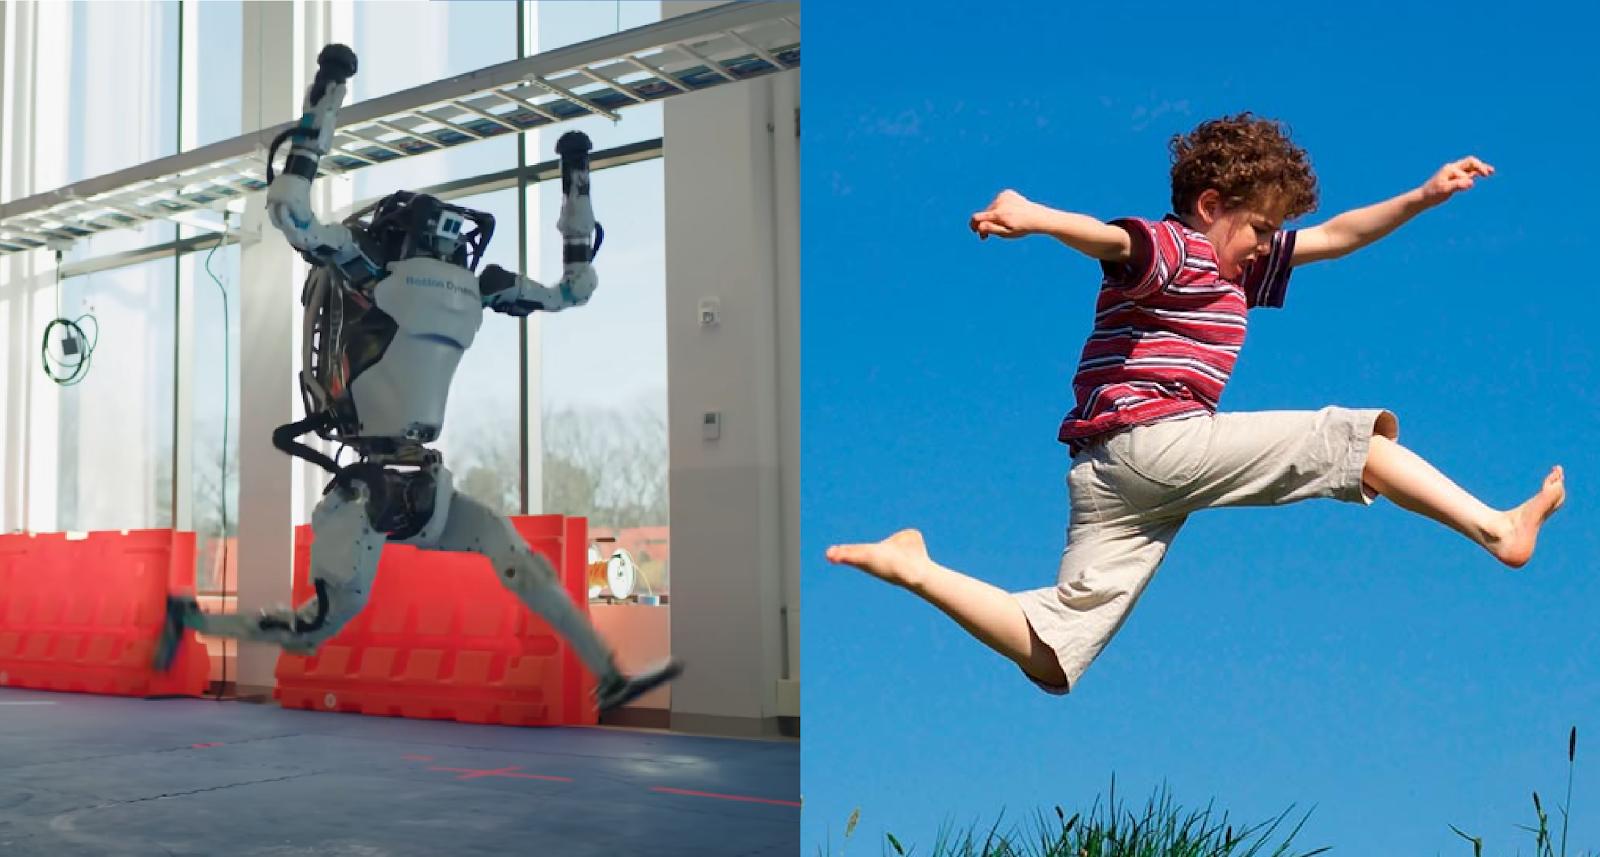 История развития Boston Dynamics от Плоского Одноногого Прыгуна до танцующего Atlas